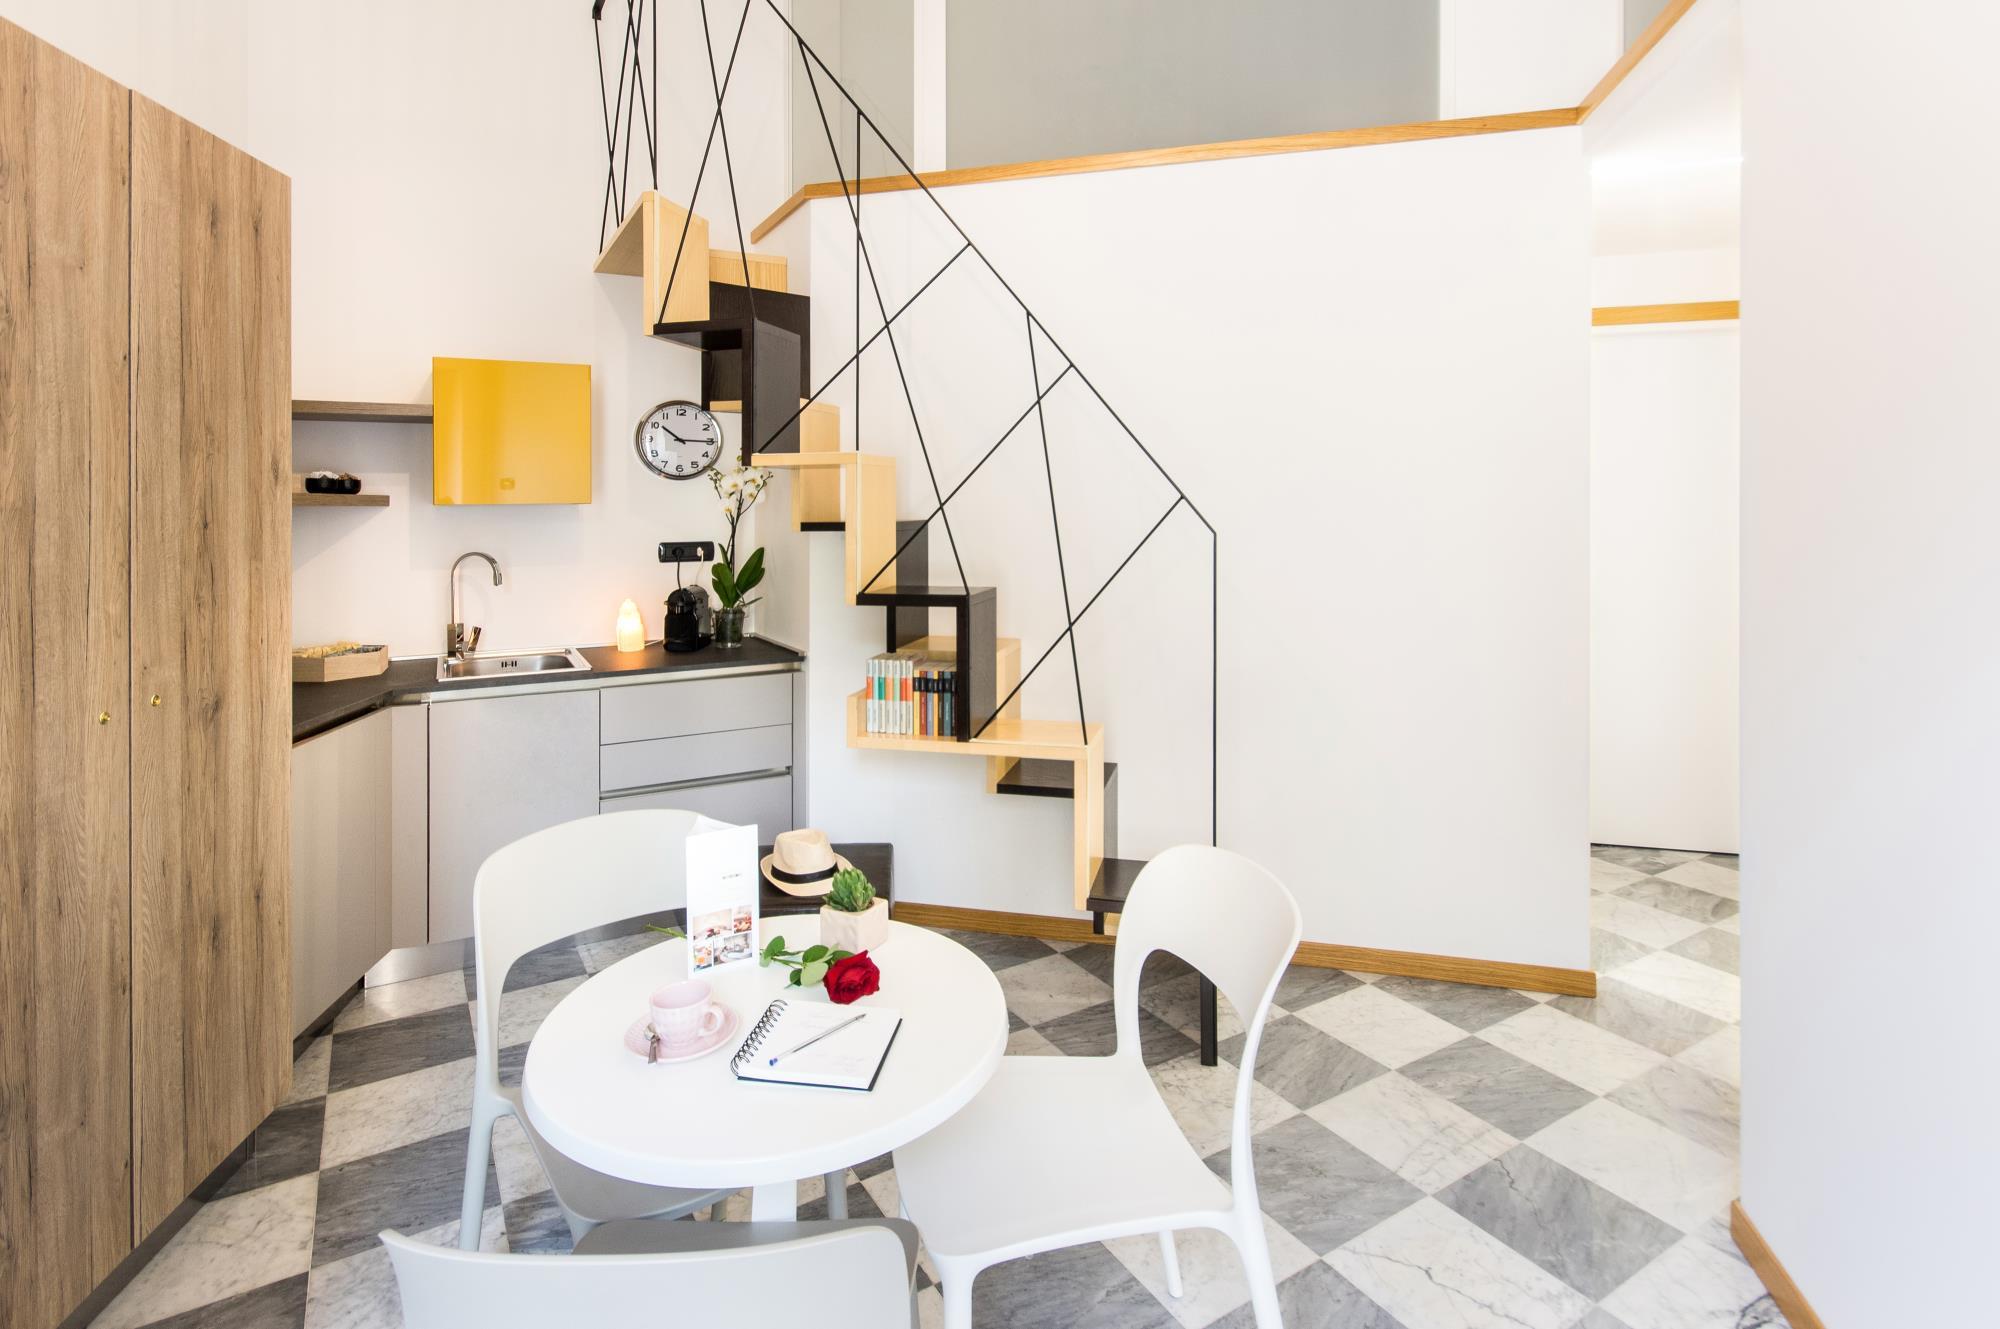 Area Living di Luce Nova, Cagliari